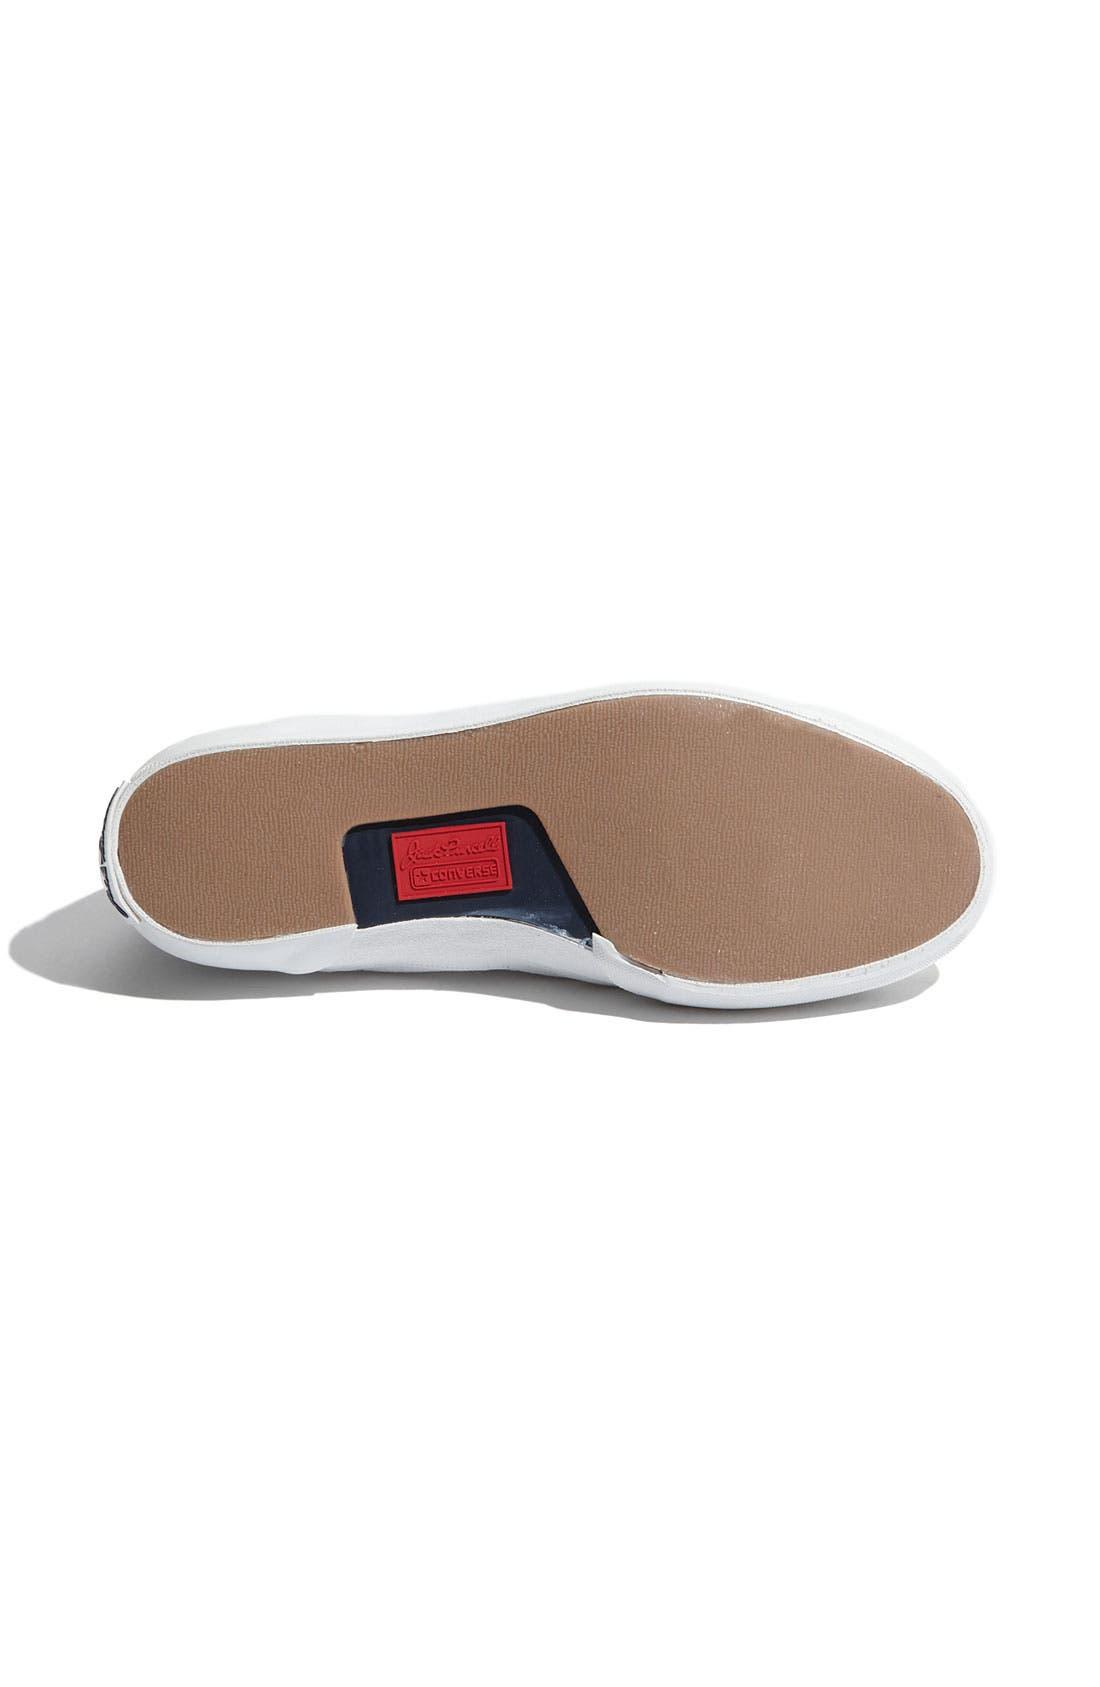 Alternate Image 4  - Converse 'Jack Purcell - Helen' Sneaker